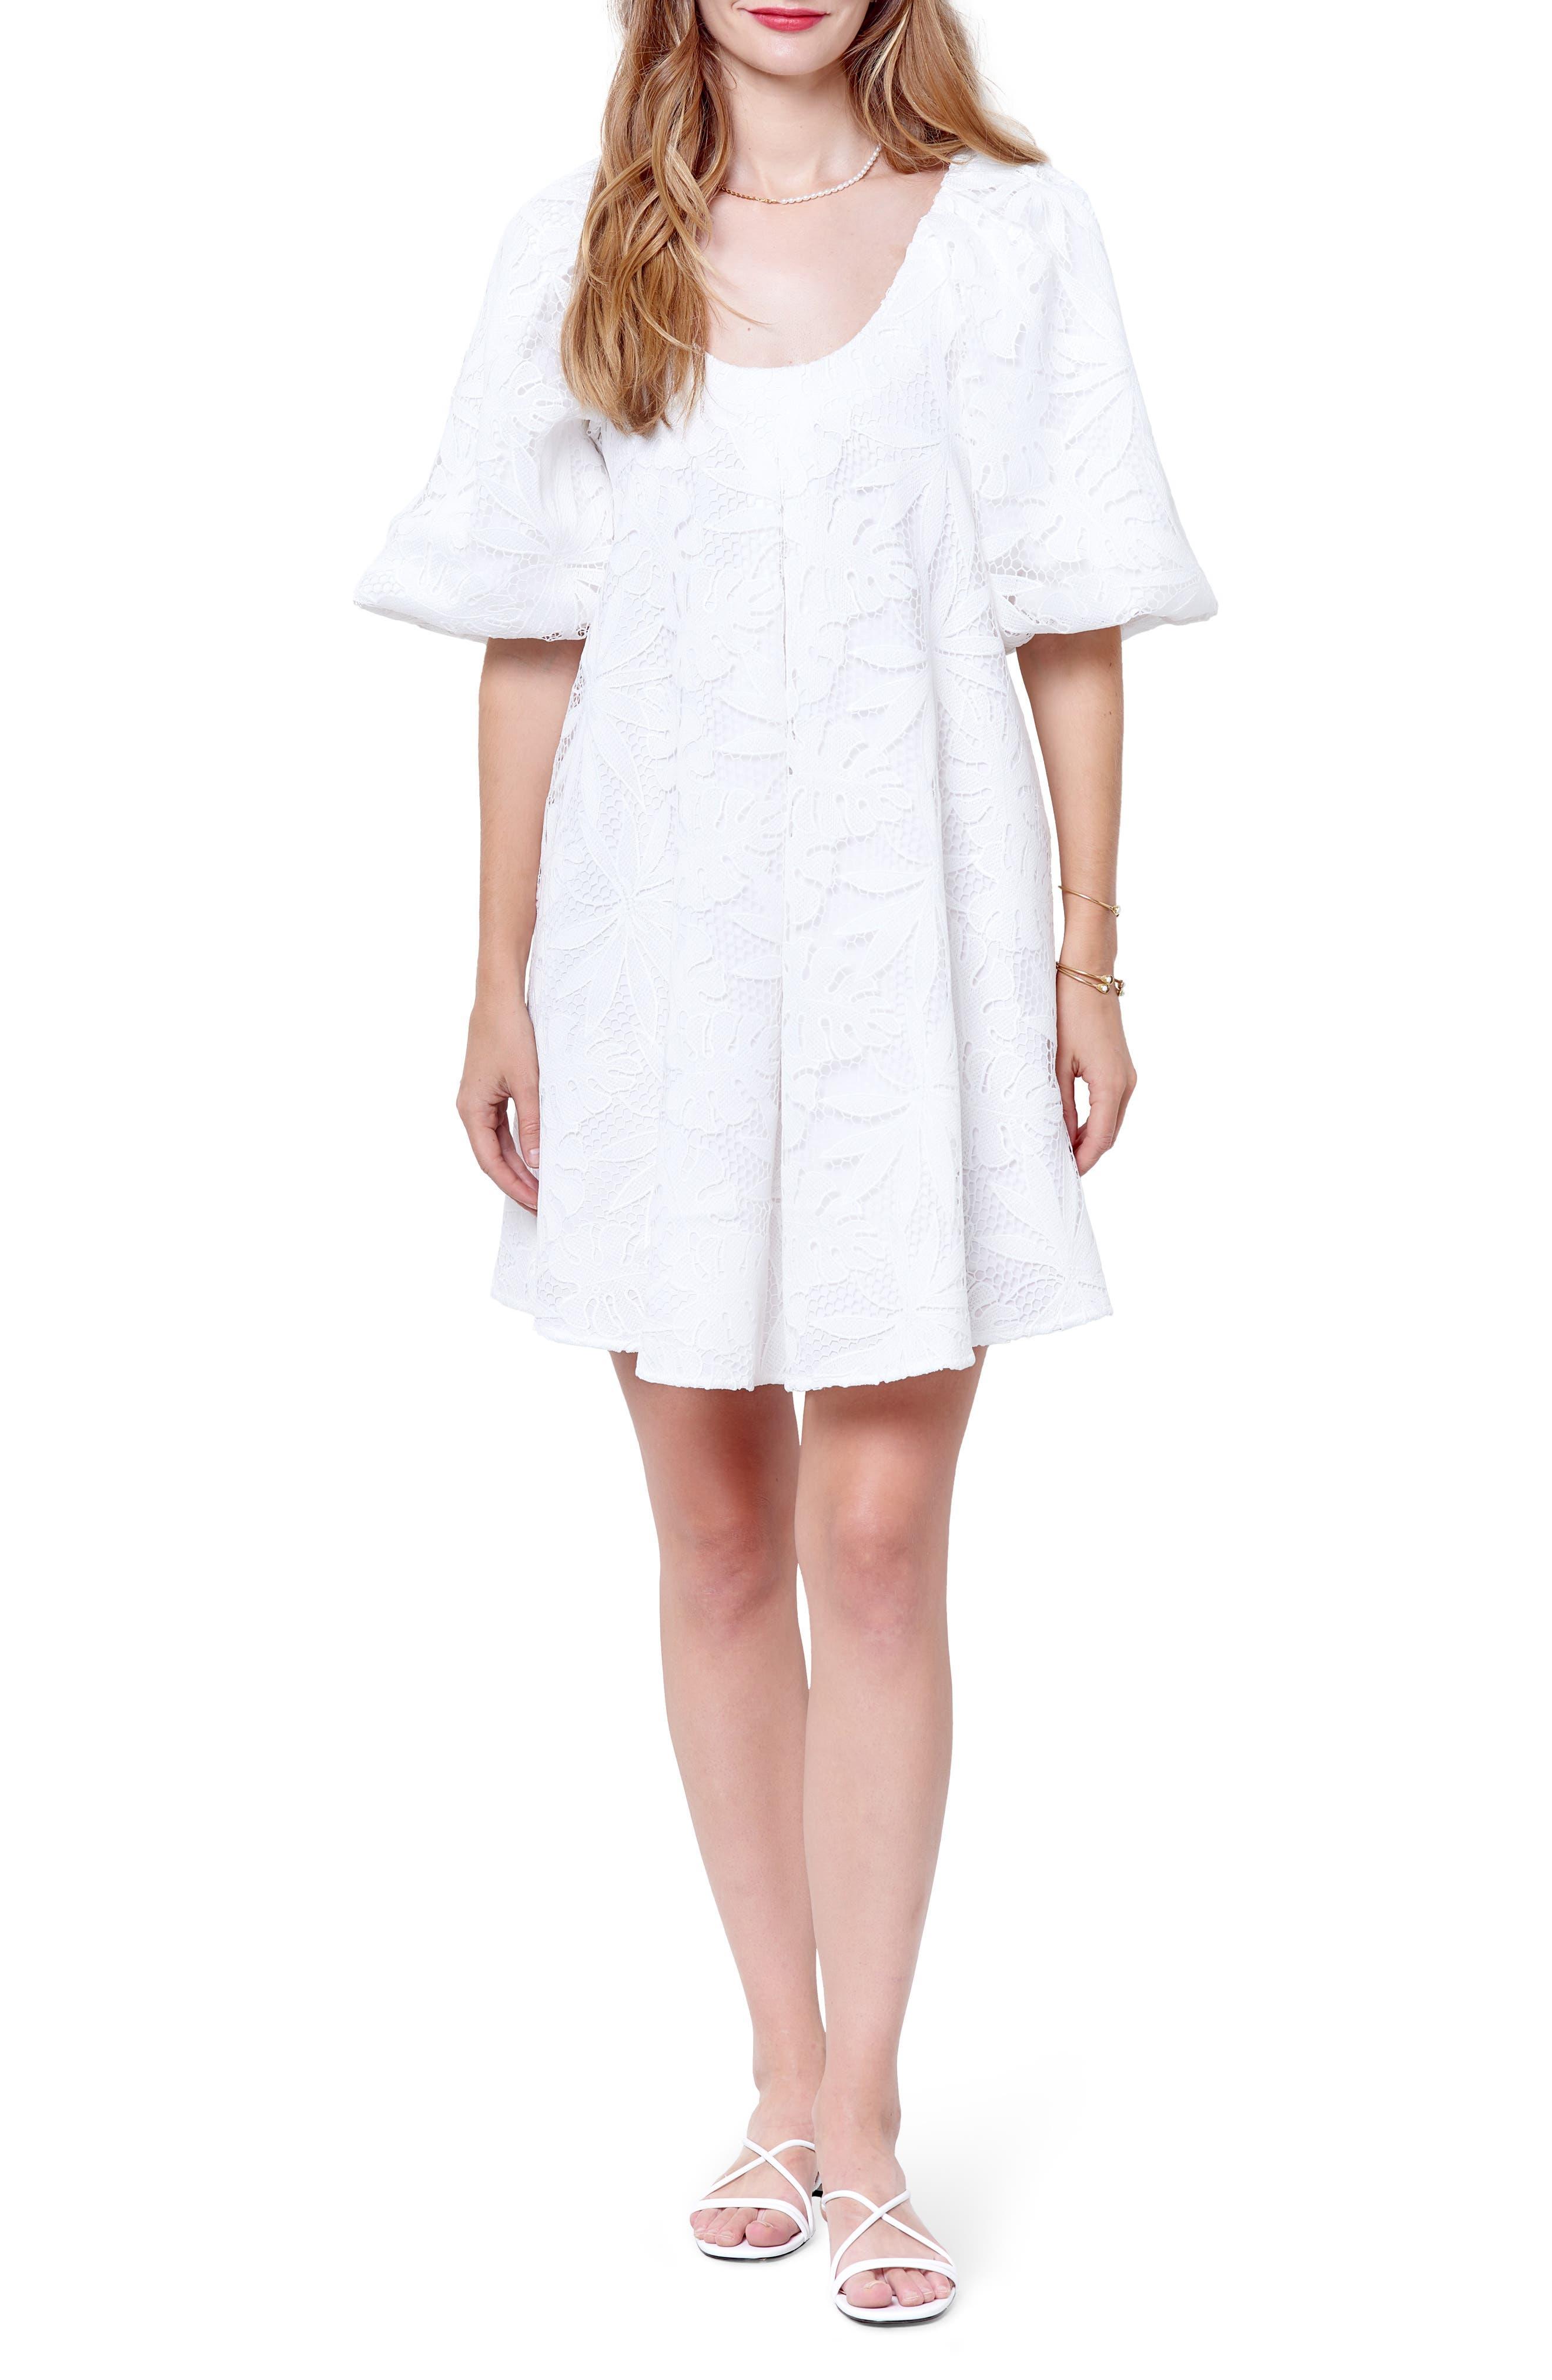 Women's Corey Lynn Carter Hariette Lace Puff Sleeve Minidress